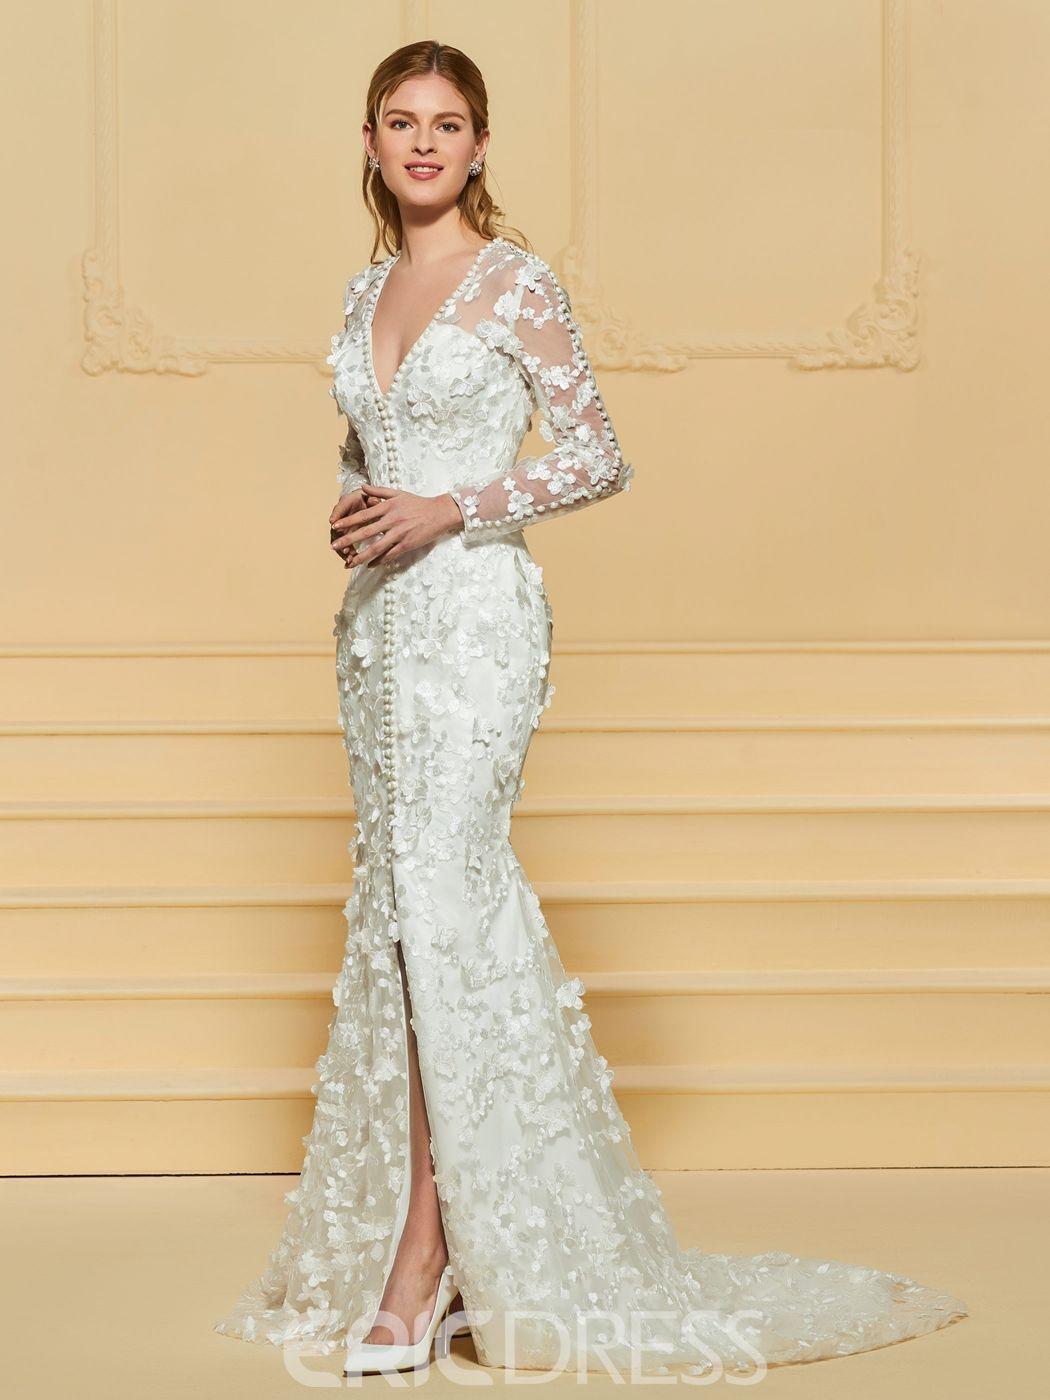 a856e77bdd8 Ericdress V Neck Mermaid Lace Wedding Dress